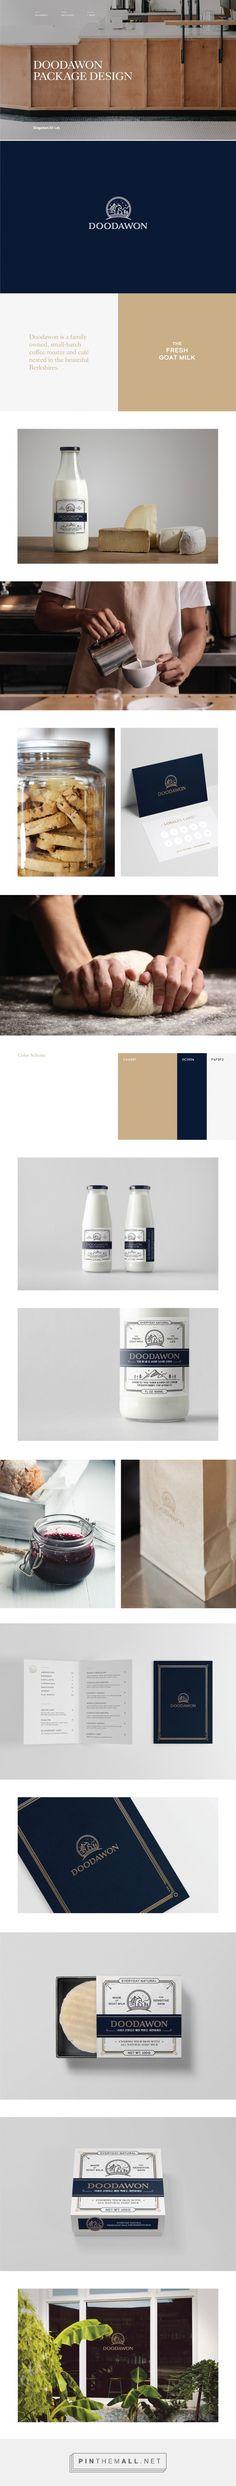 Doodawon Goat Milk packaging design by Kingsmen BX Lab - http://www.packagingoftheworld.com/2017/12/doodawon-goat-milk.html